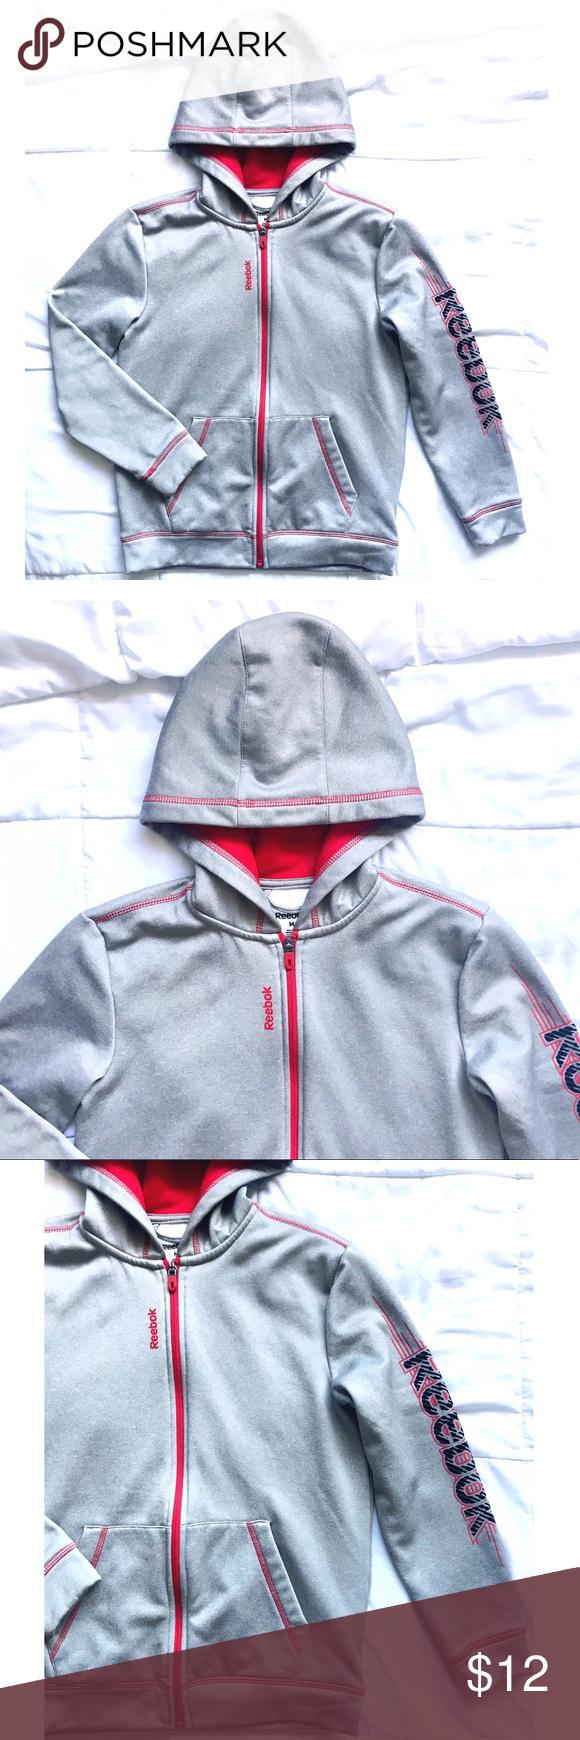 55f02a0d3c39 Reebok Gray Full Zip Up Jacket Size Medium in 2018